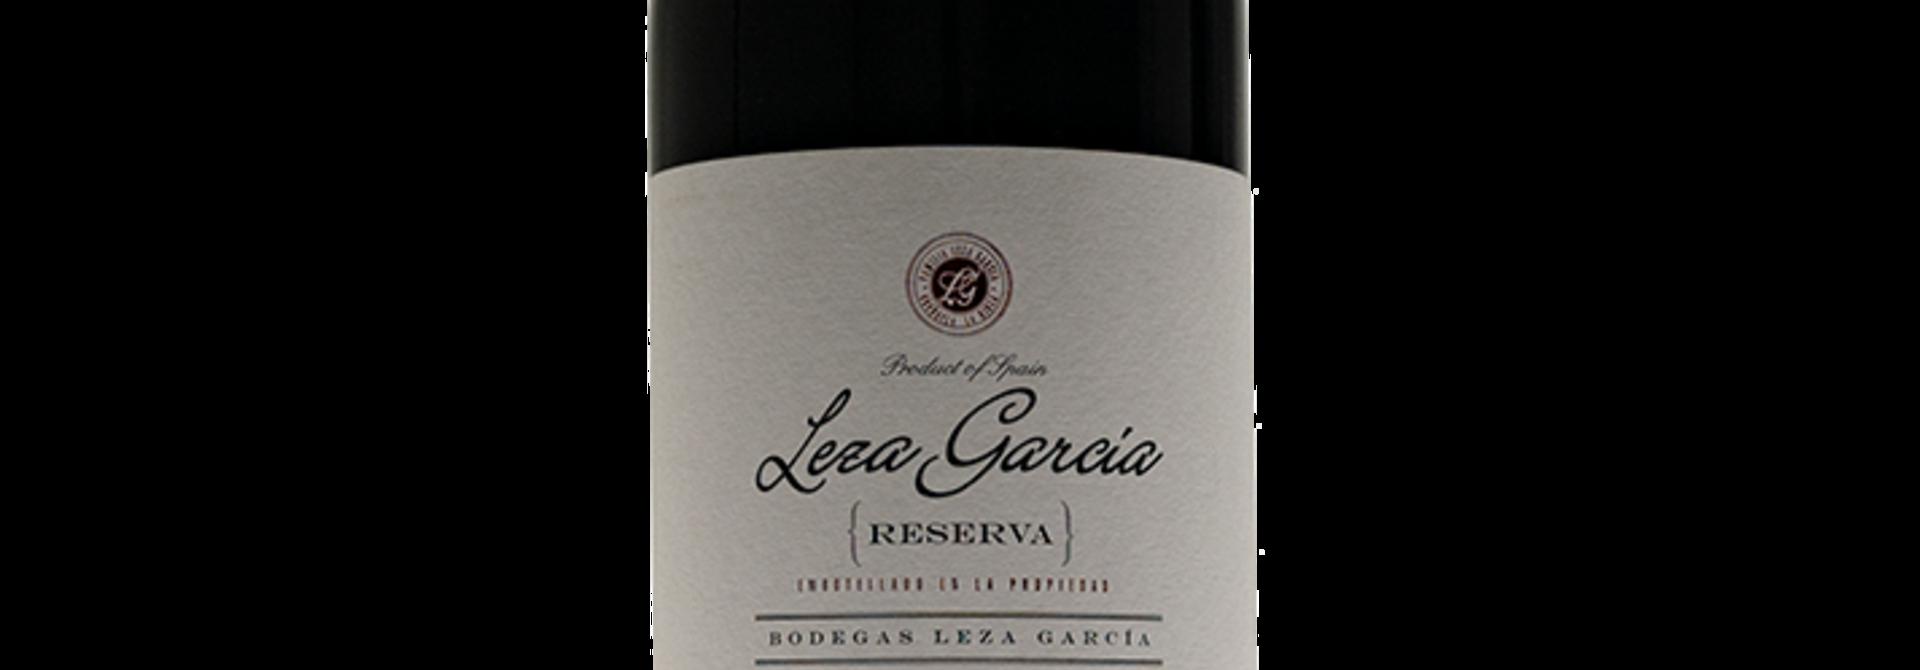 Rioja Leza Garcia Reserva 2015